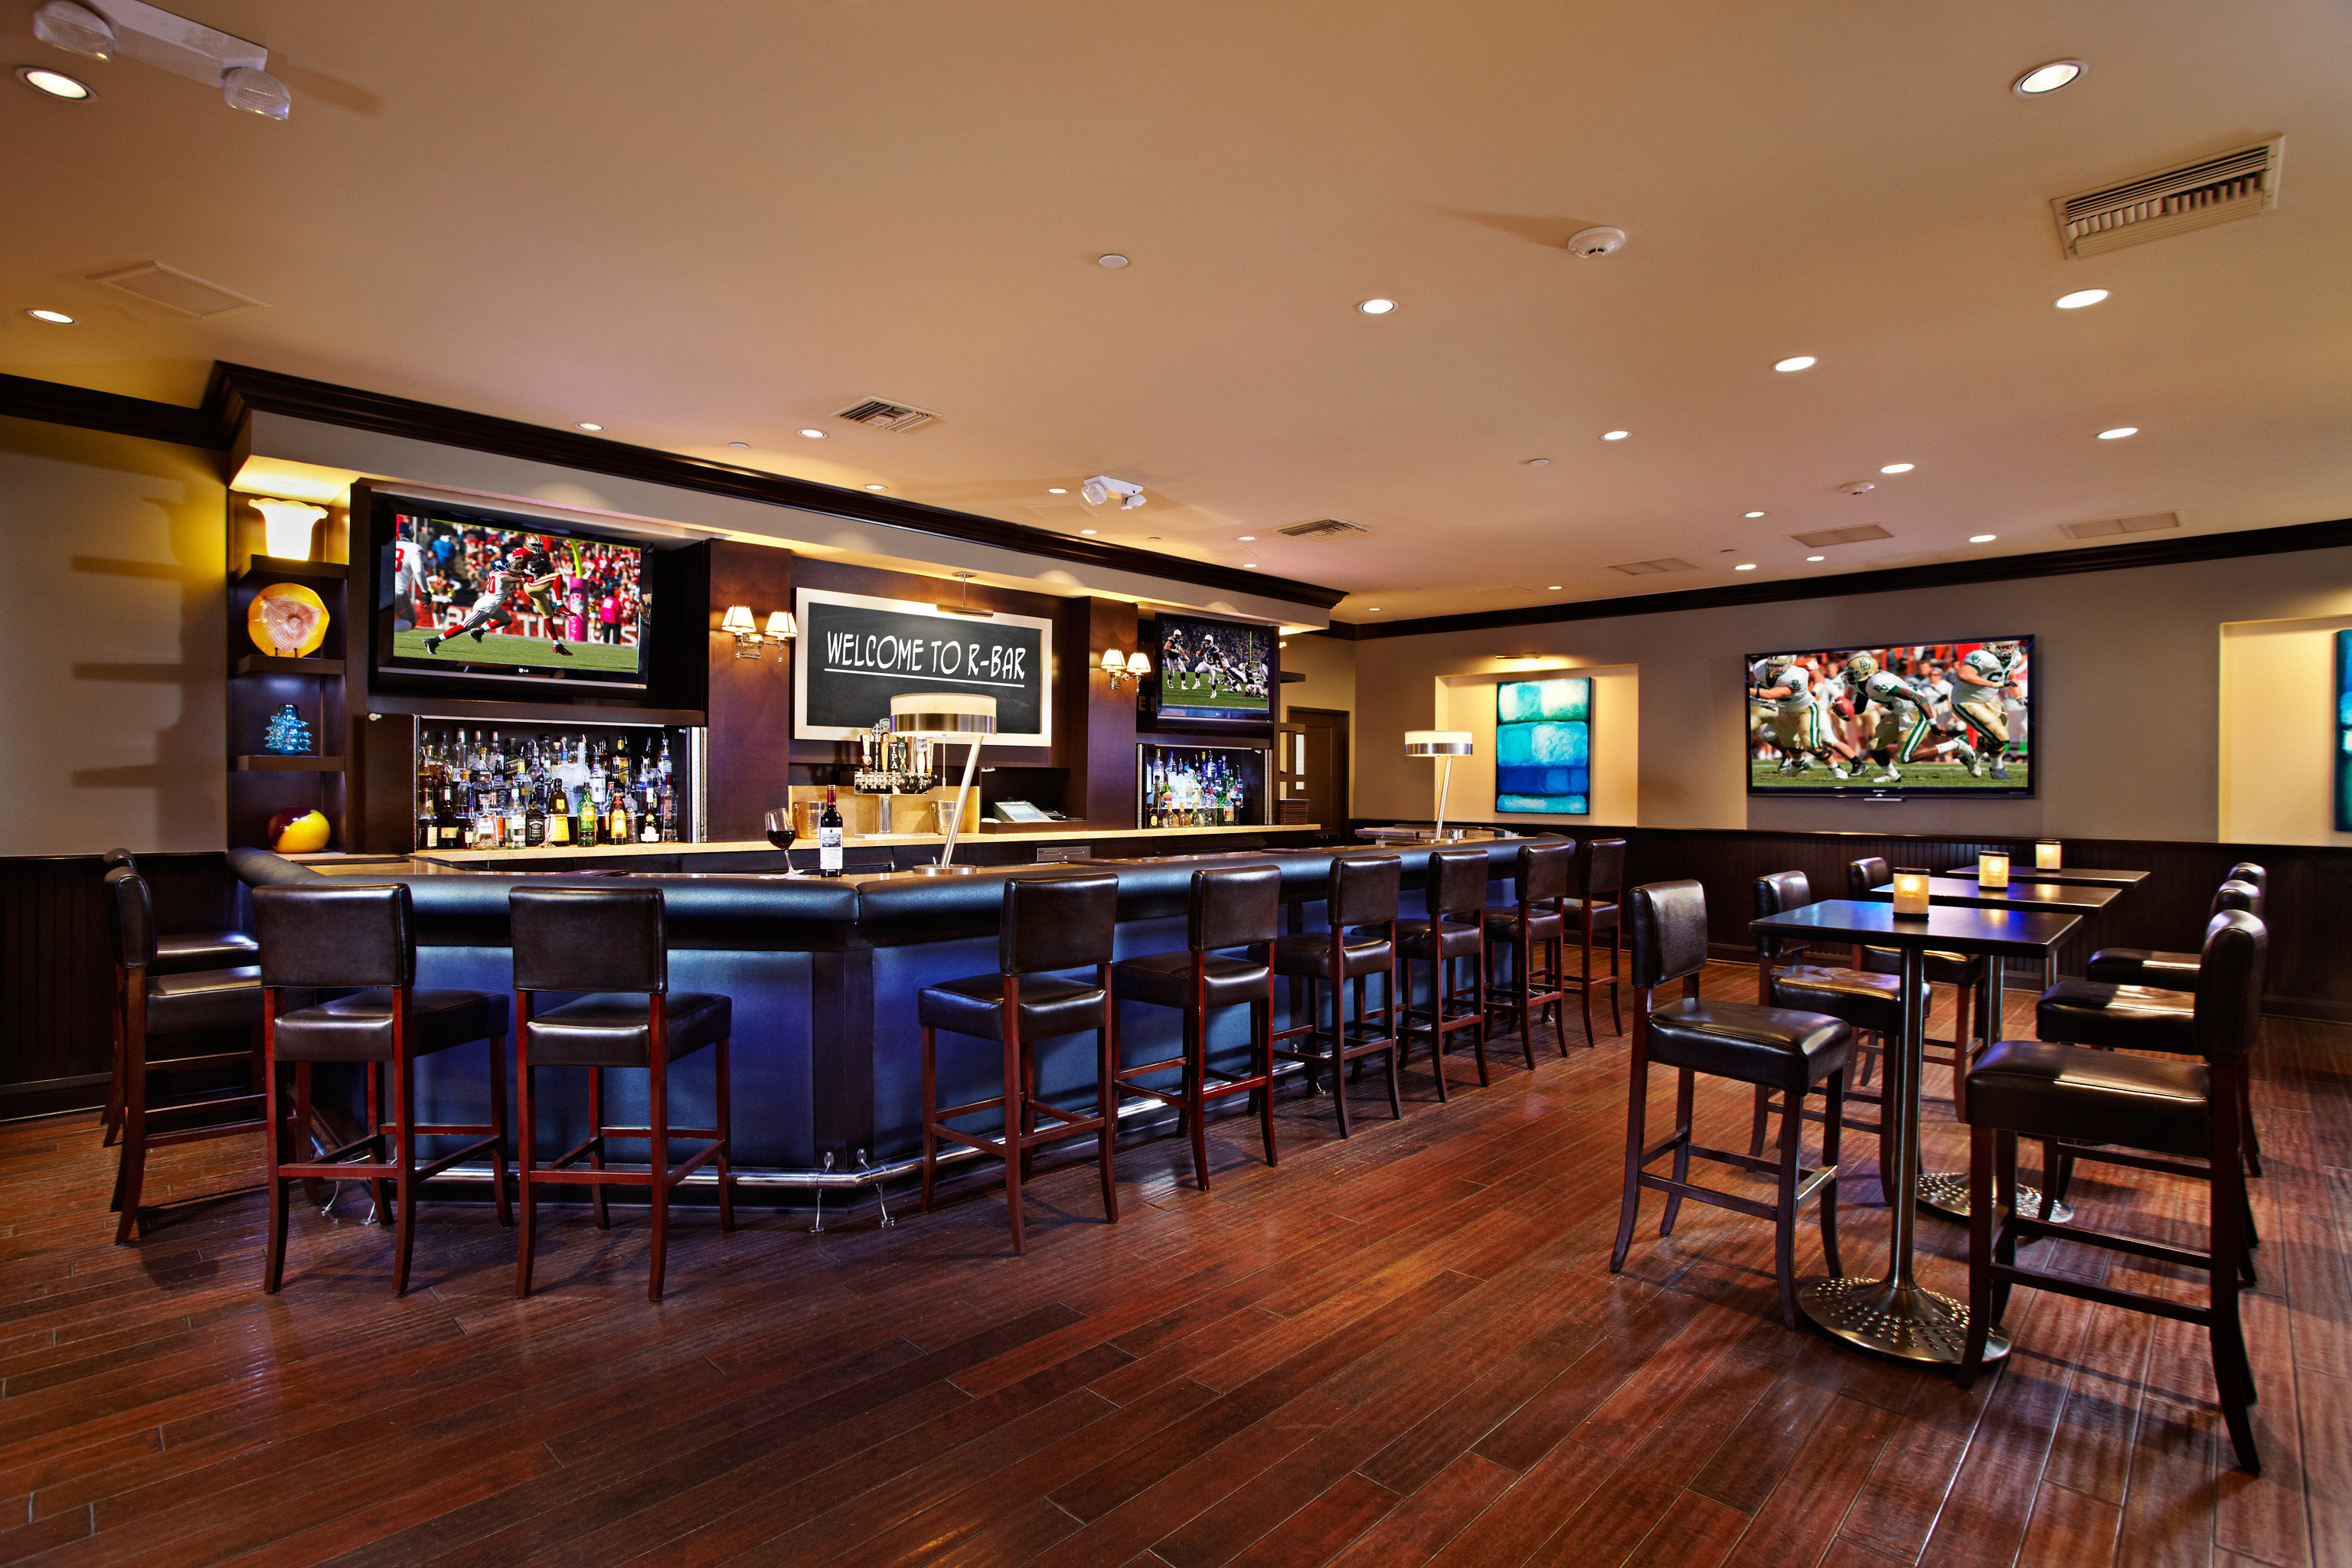 Bar Dining Drink Eat recreation room billiard room restaurant function hall café food court cafeteria